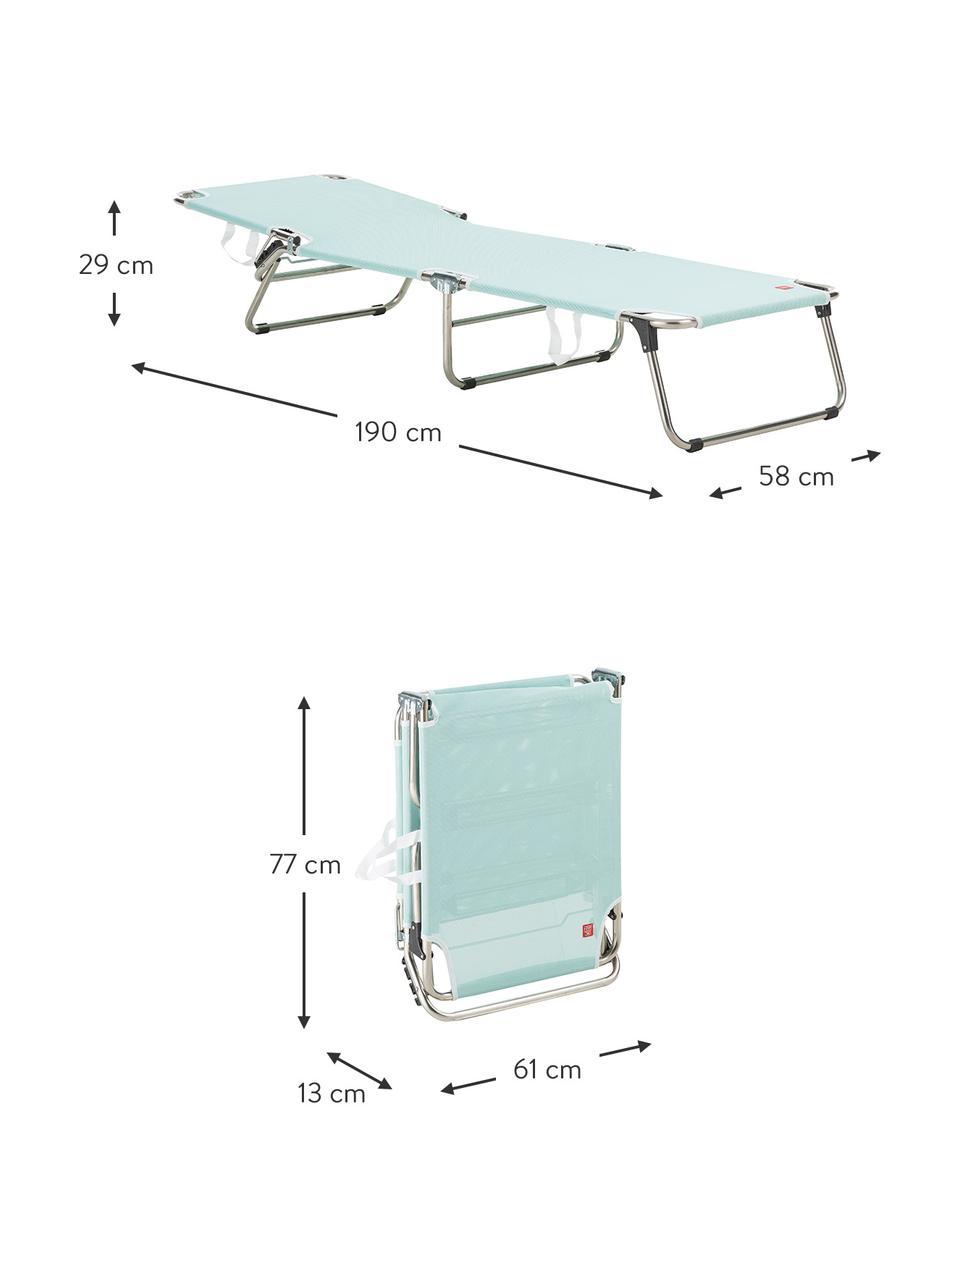 Gartenliege Fiam Amigo ohne Armlehne, Gestell: Aluminium, Bezug: Polyester, Gestell: Aluminium Bezug: Aquablau, 58 x 190 cm